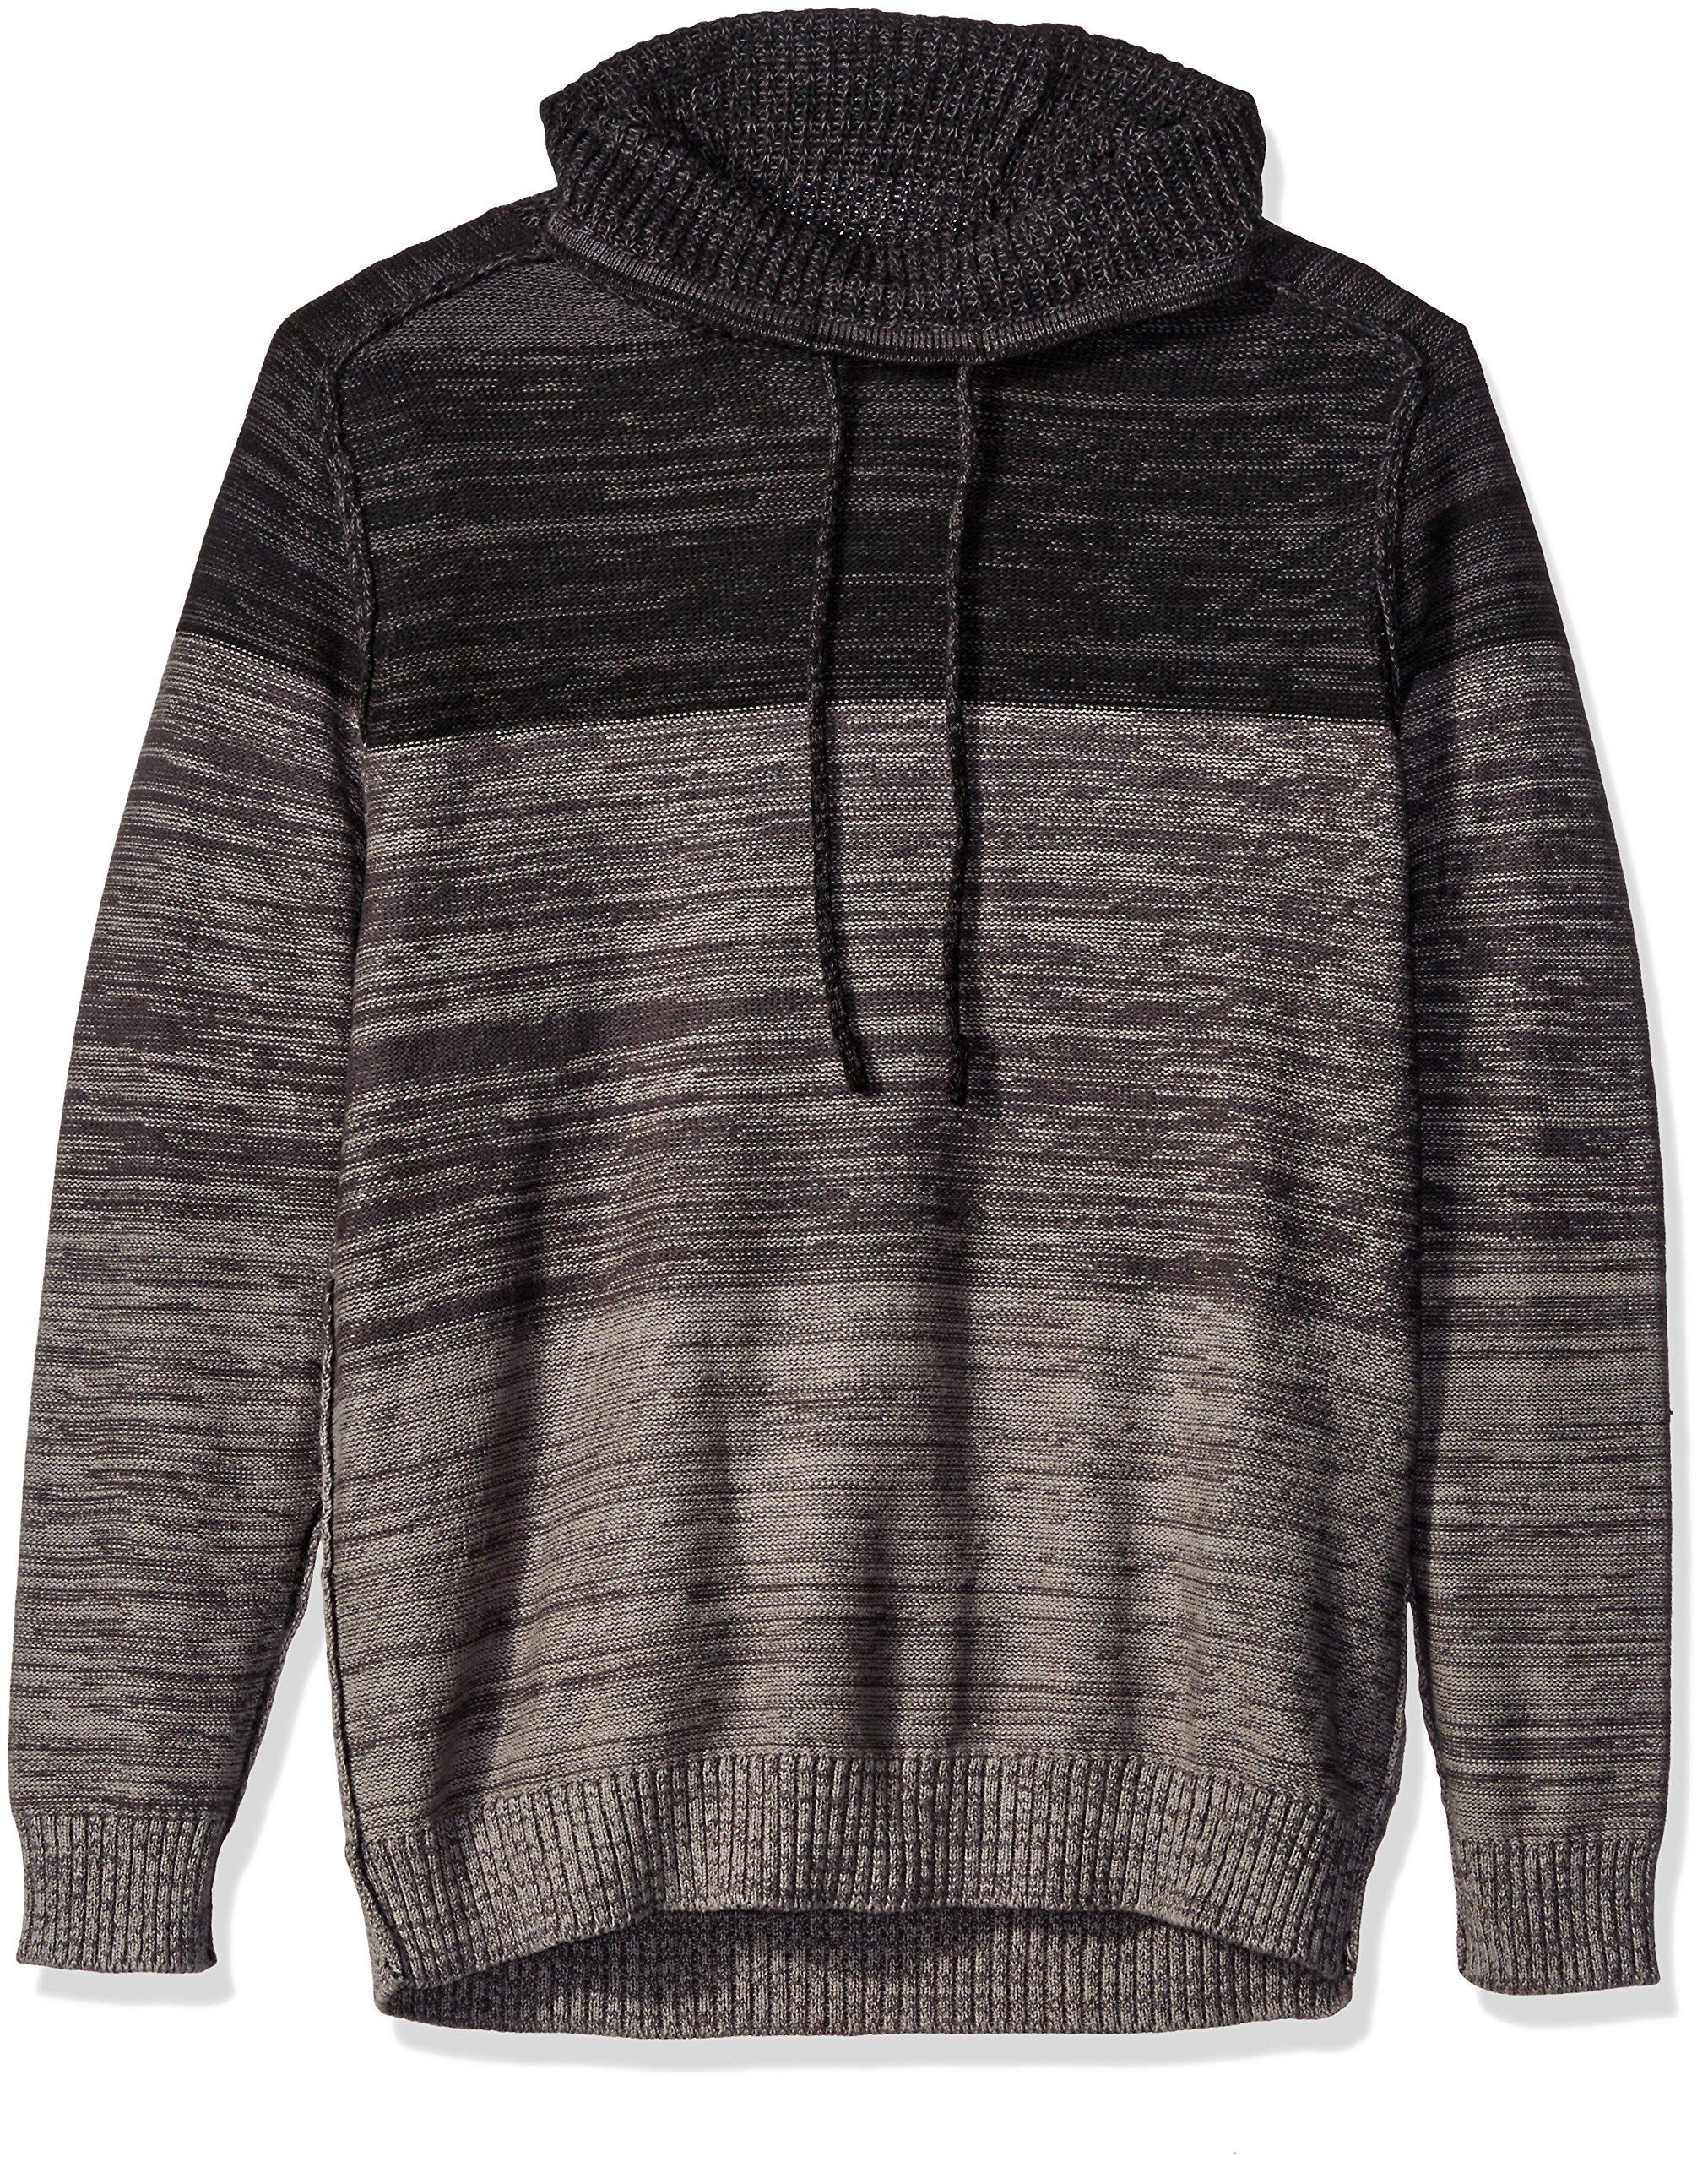 Blizzard Bay Men's Color Block Cowl Neck Sweater, Grey/Black, Large